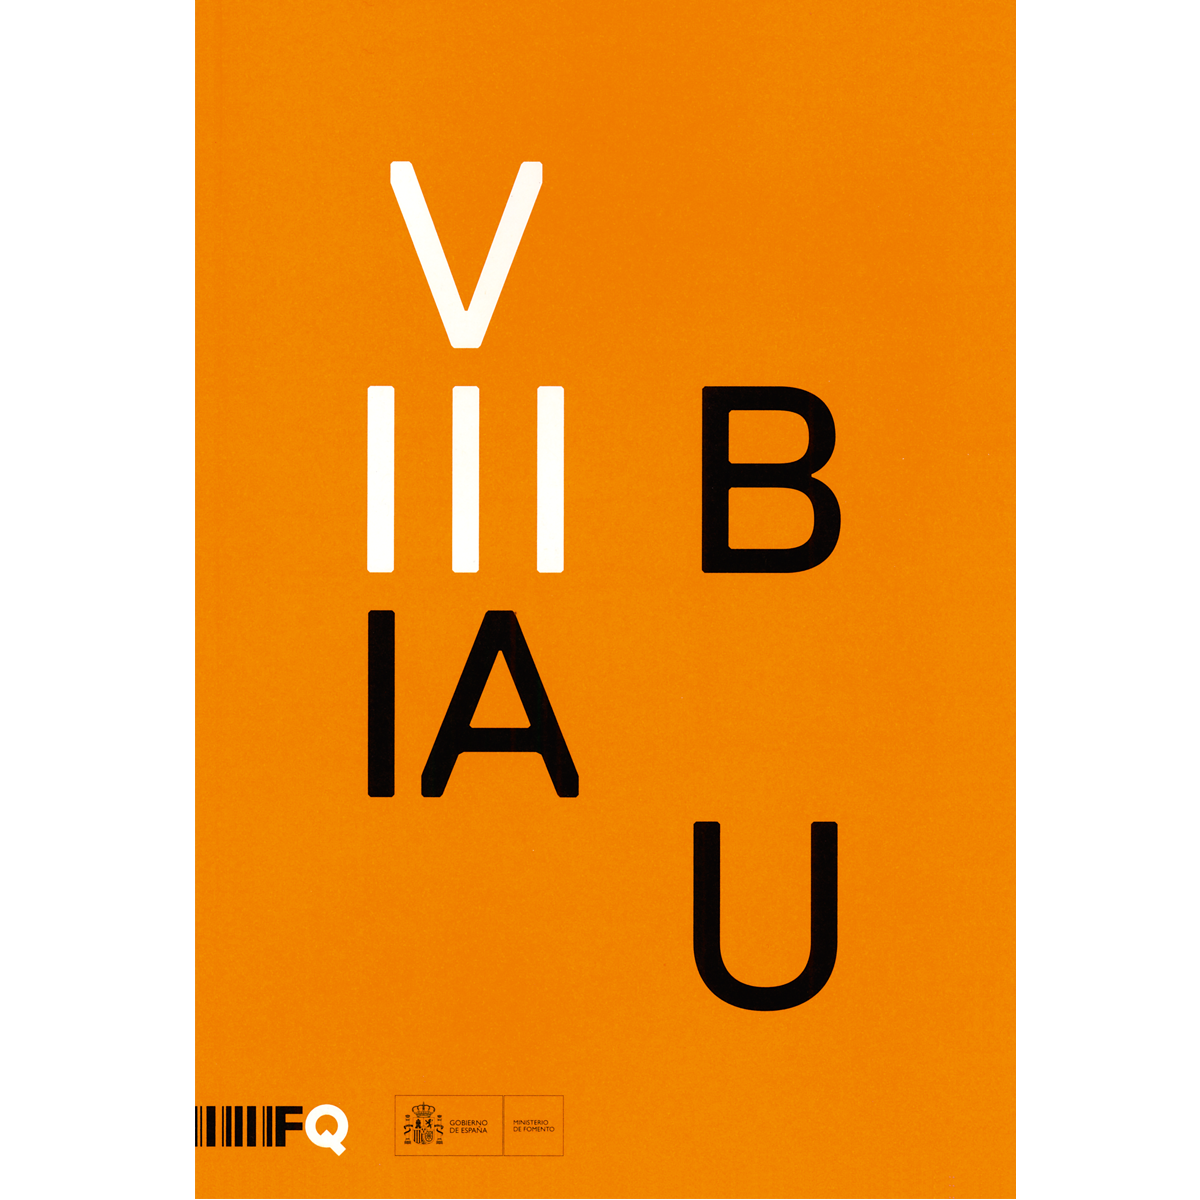 VIII Bienal Iberoamericana  de Arquitectura y Urbanismo